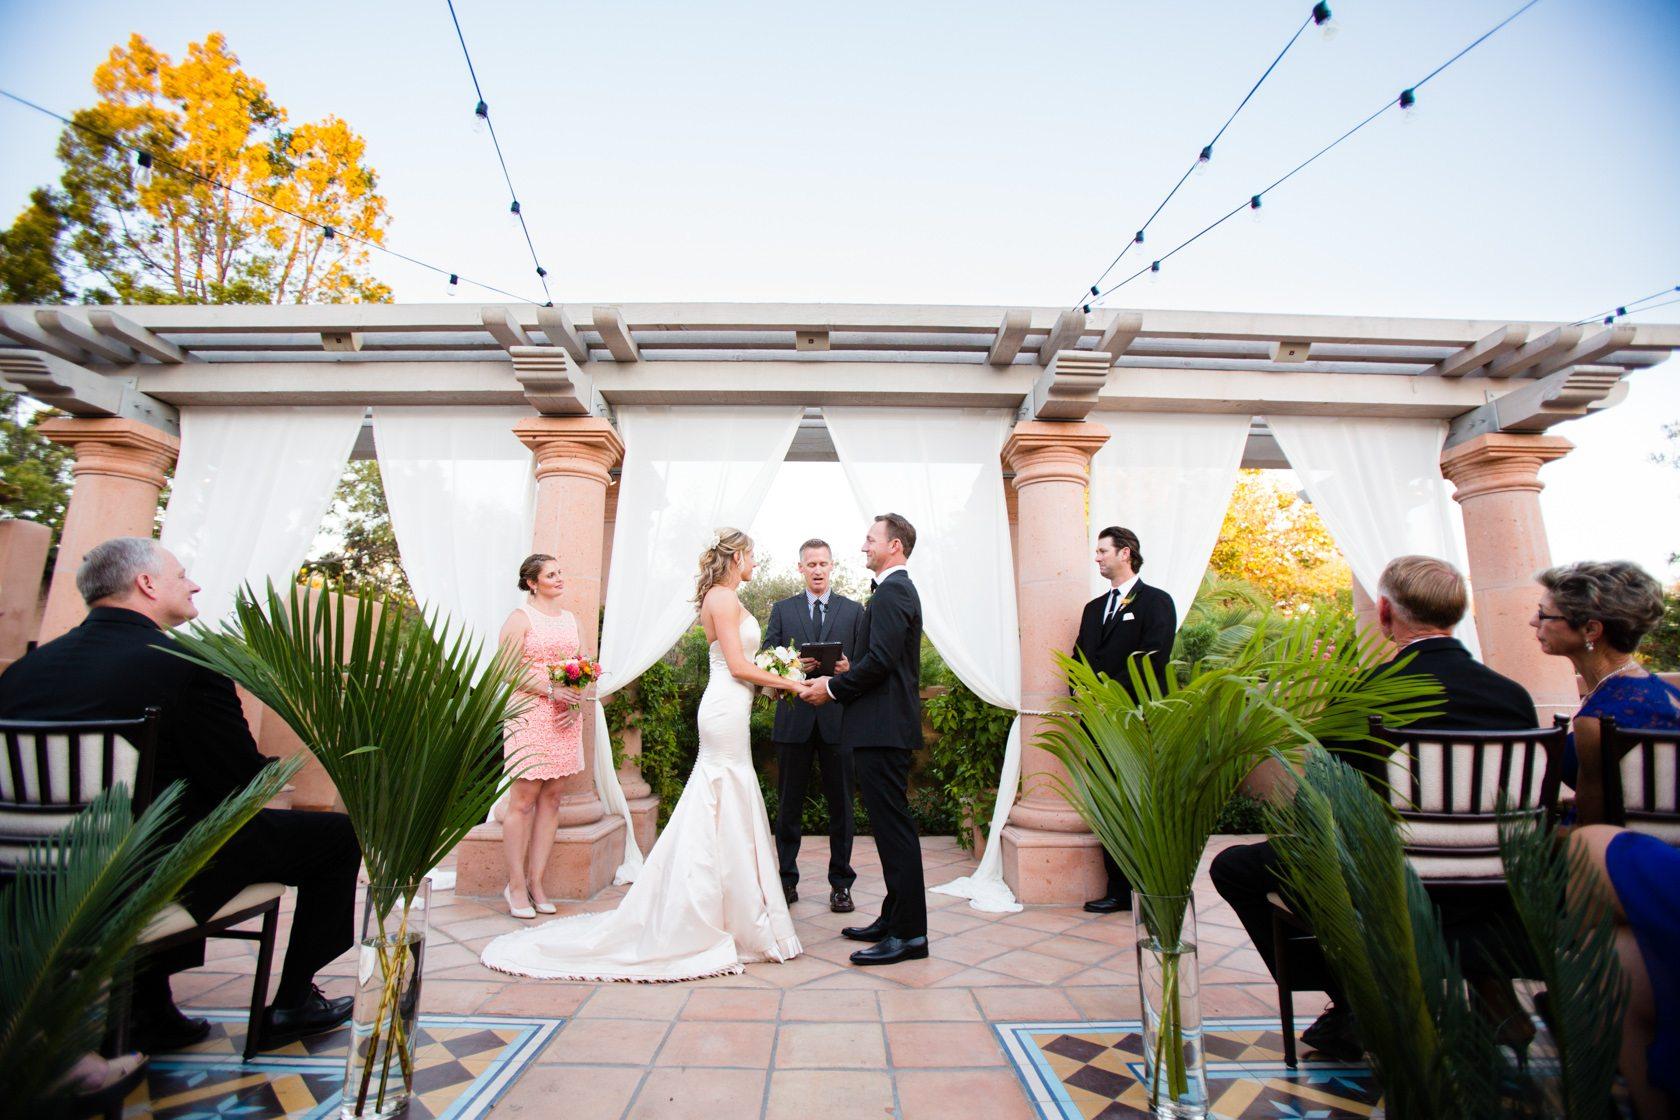 Rancho_Valencia_Resort_Wedding_075.jpg